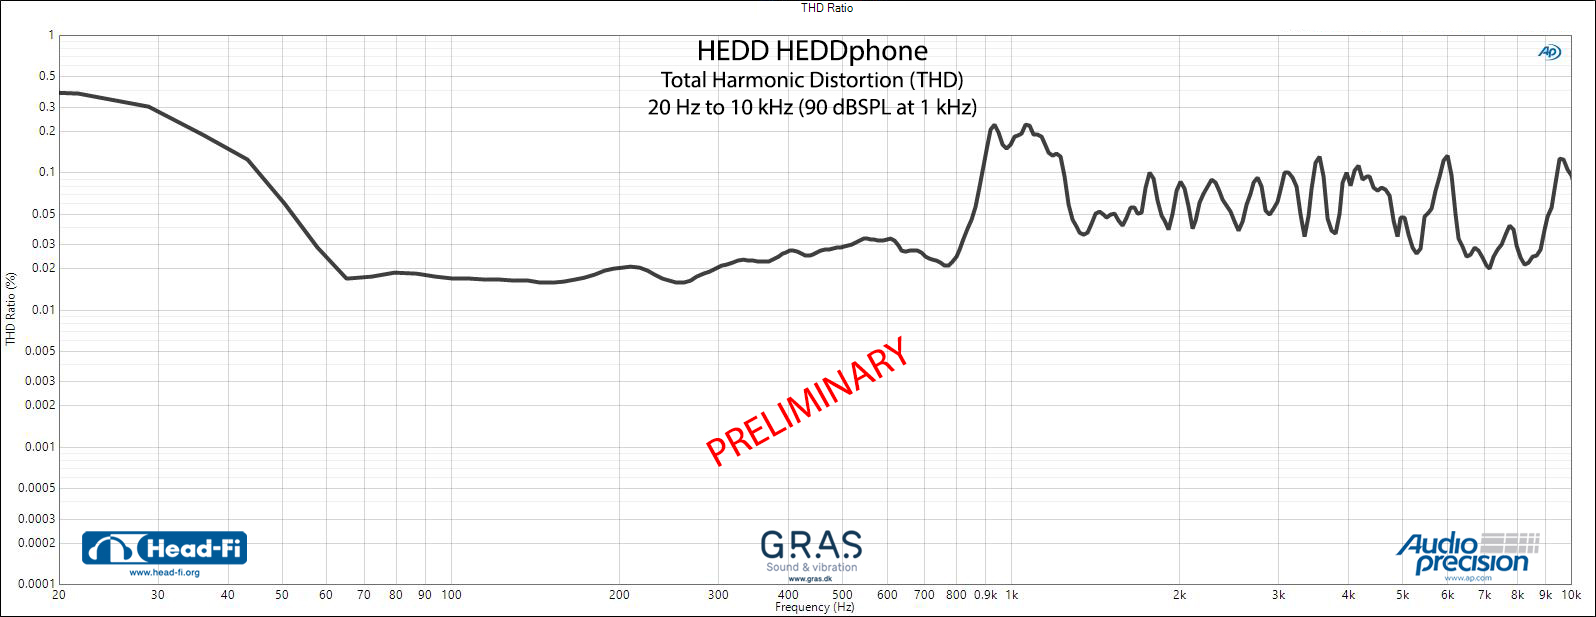 HEDD_HEDDphone_Measurements_THD_PRELIMINARY.jpg